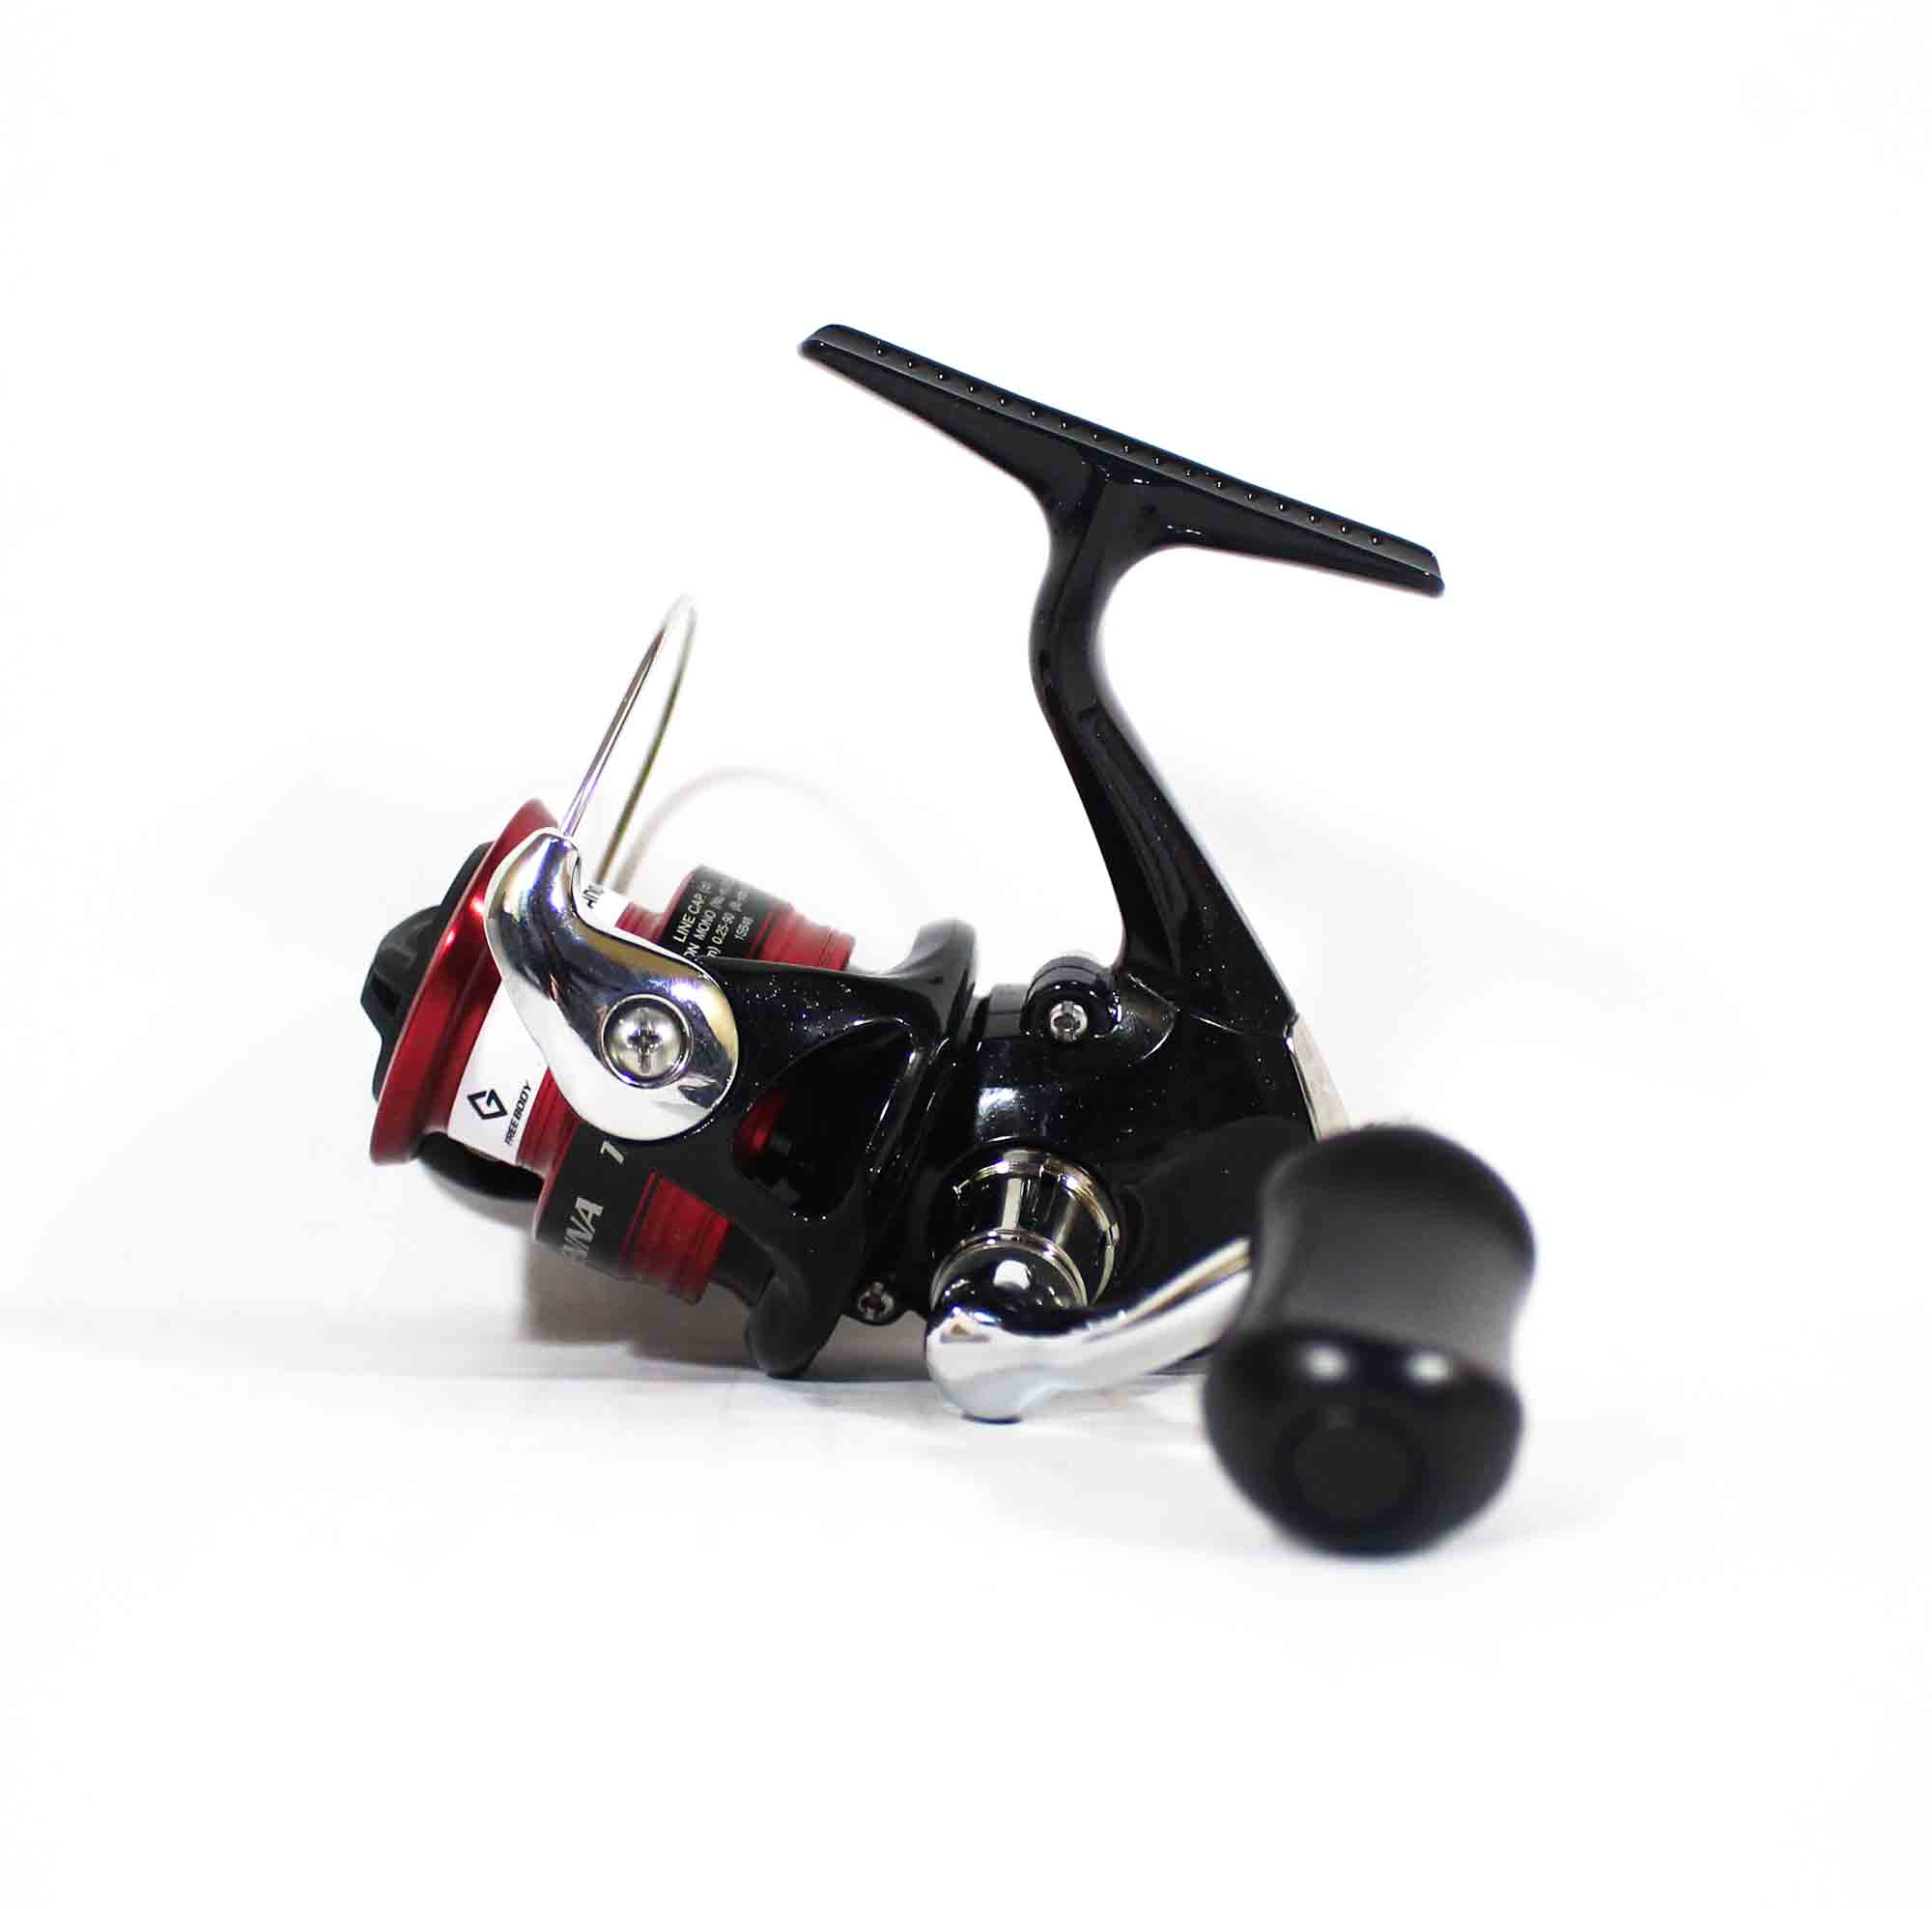 Shimano Reel Spinning Sienna FG 1000 (2616)